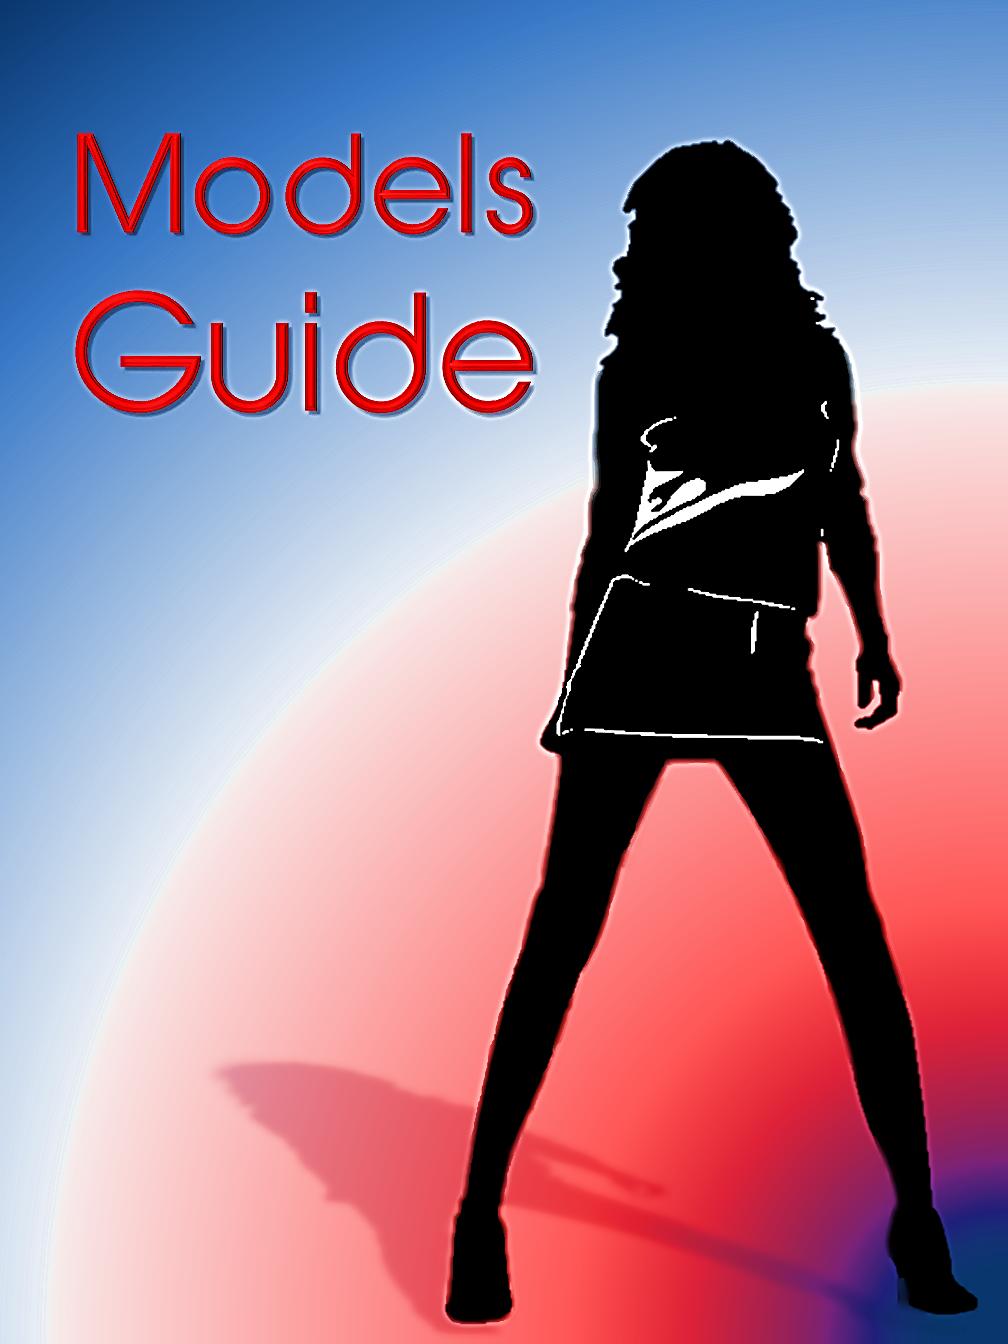 Models Guide